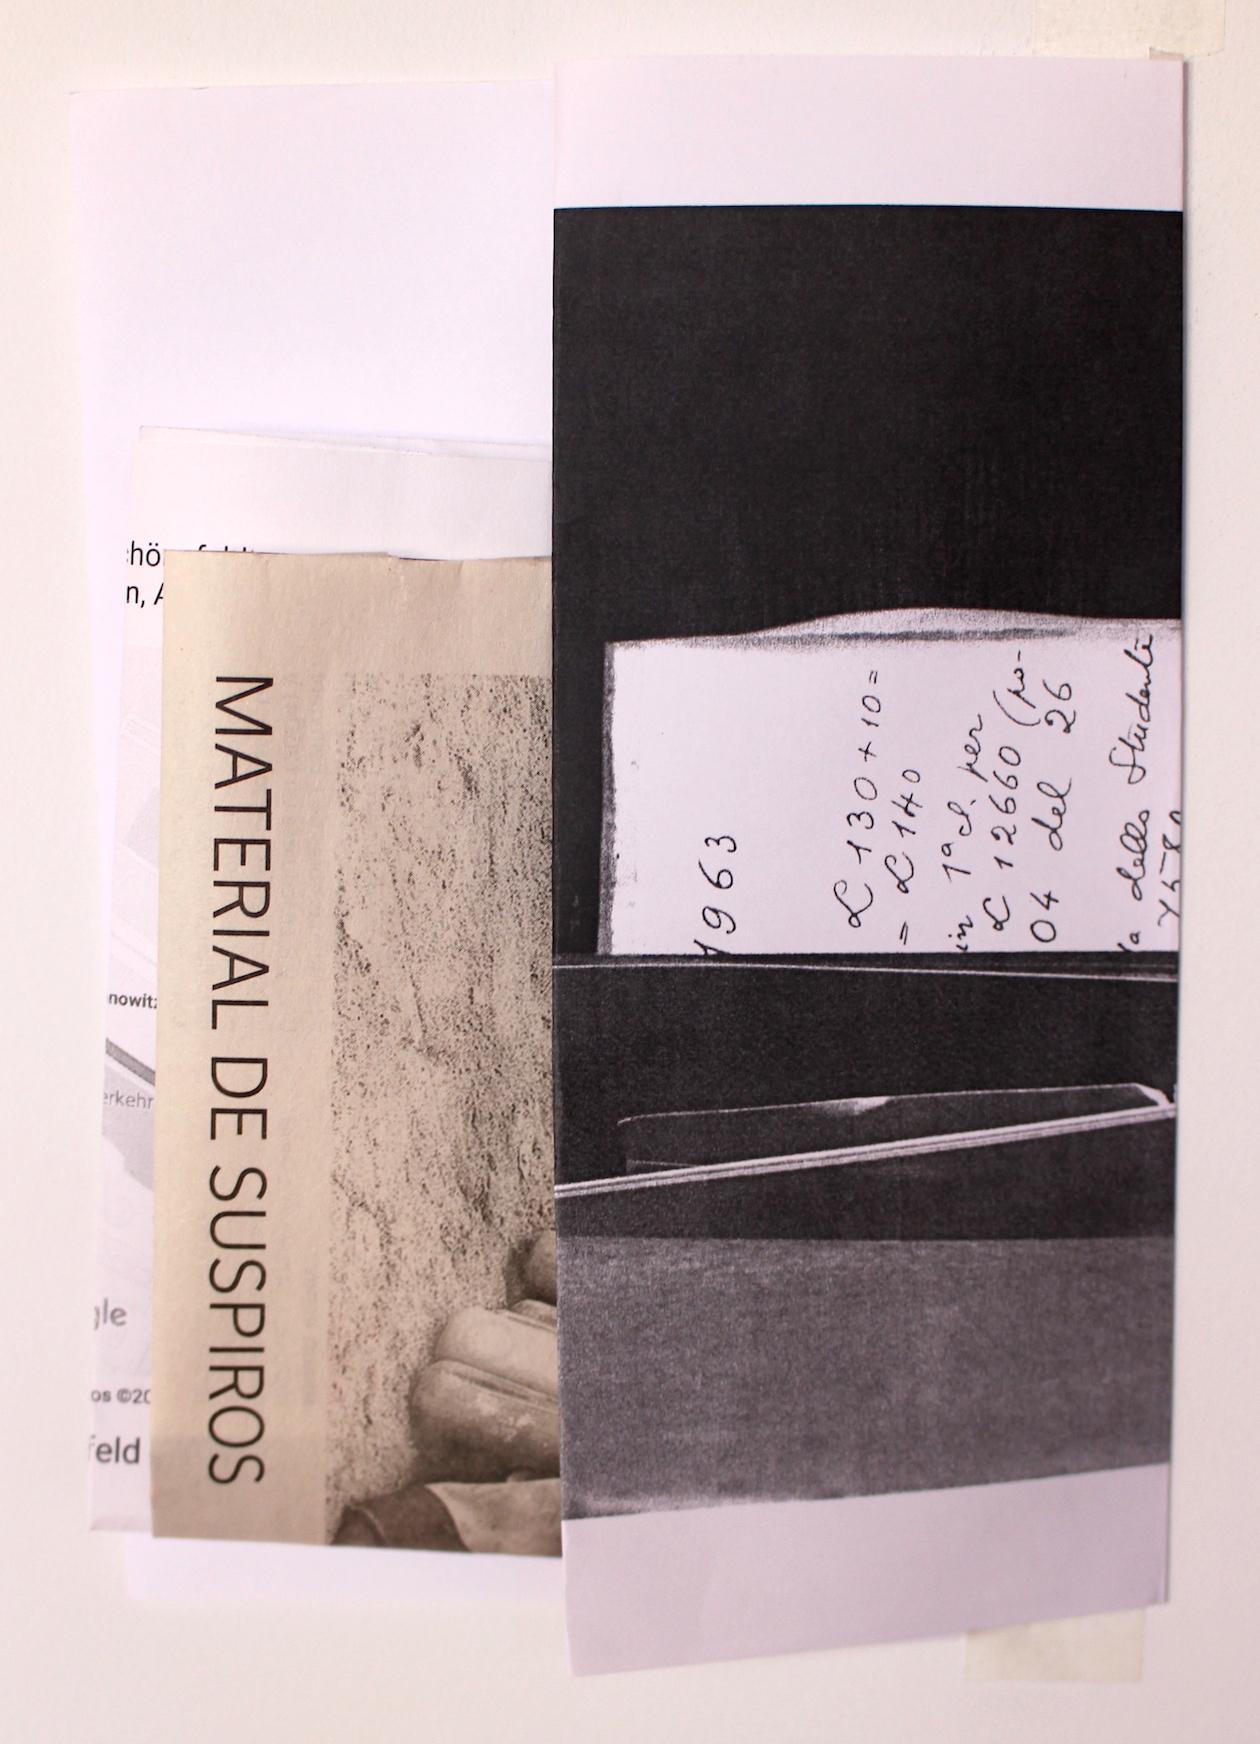 SILVIA GARCÍA GONZÁLEZ Collage. Rastro Material. Mal de archivo 2019